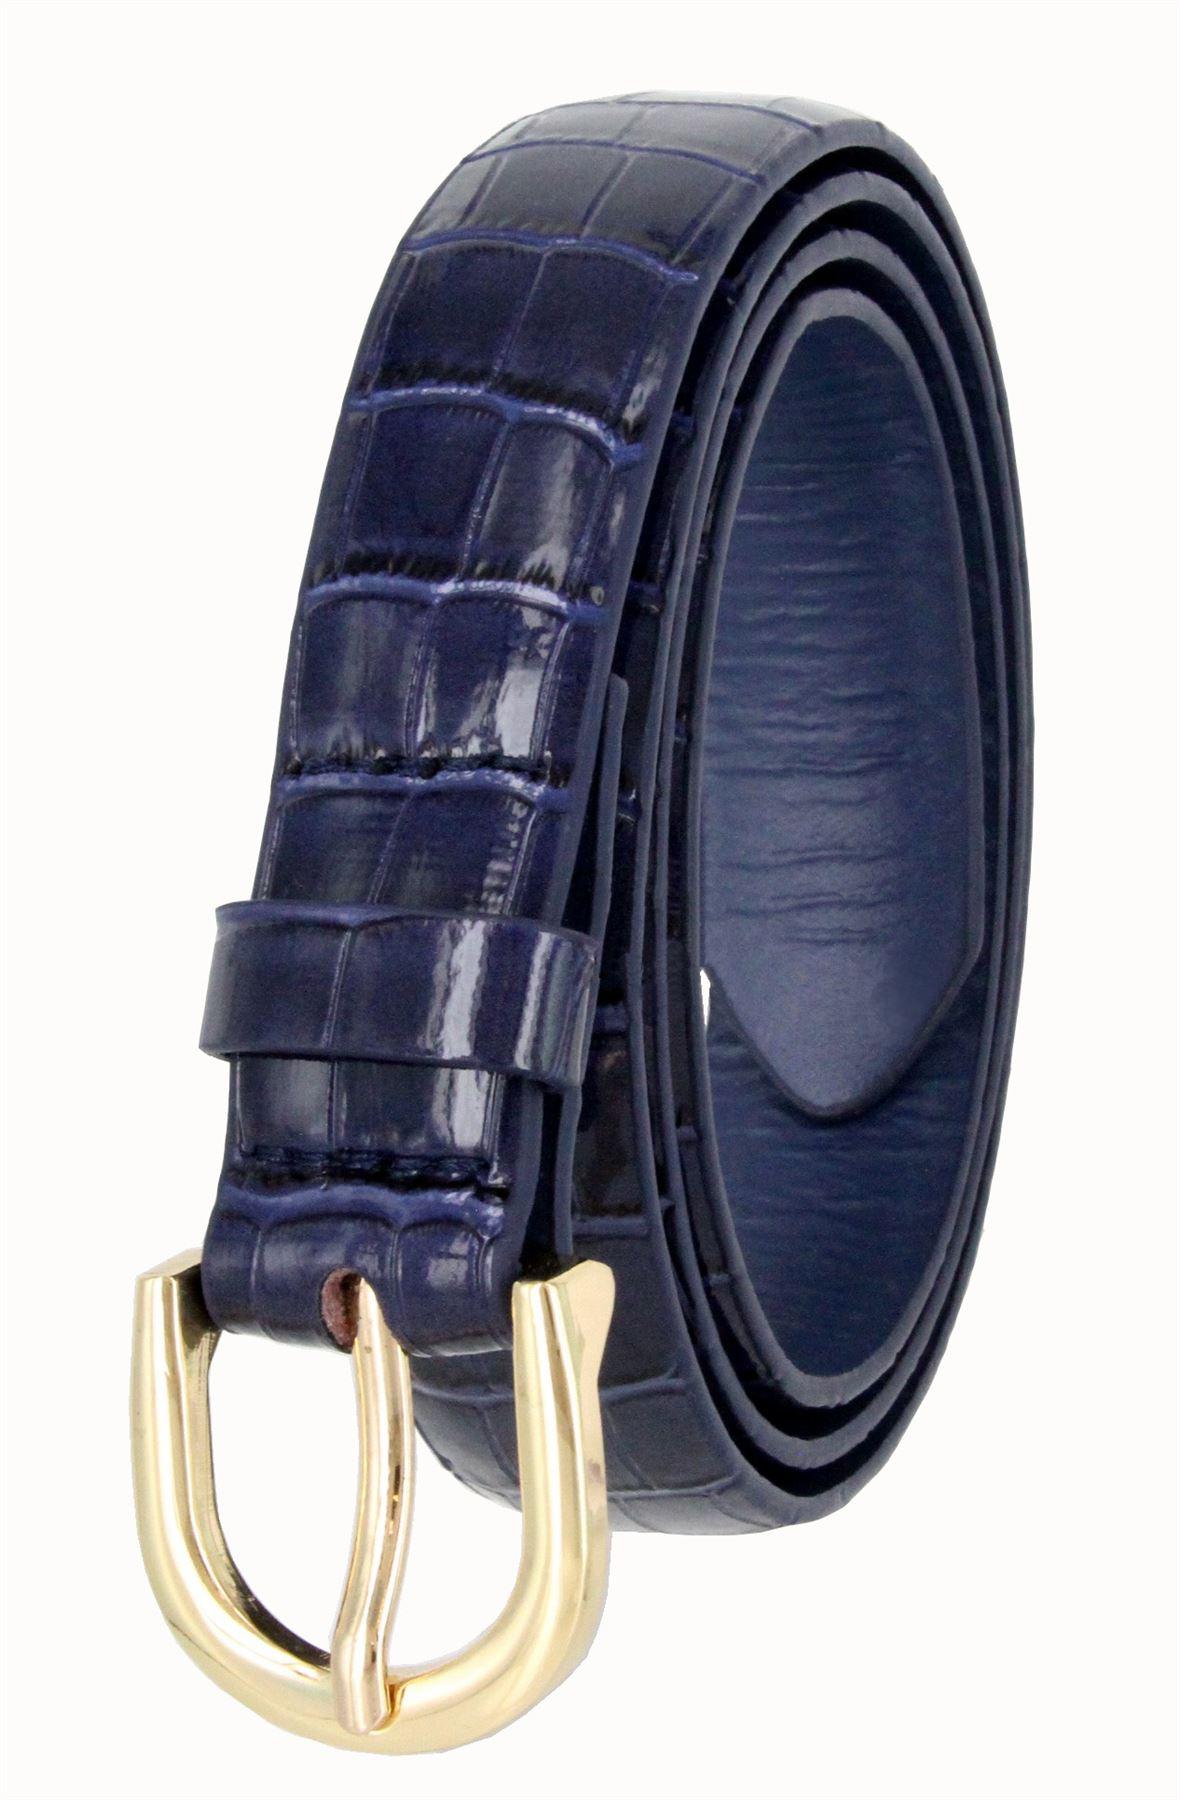 Women-039-s-Skinny-Thin-Alligator-Embossed-Genuine-Leather-Belt-1-034-25mm-Wide thumbnail 13